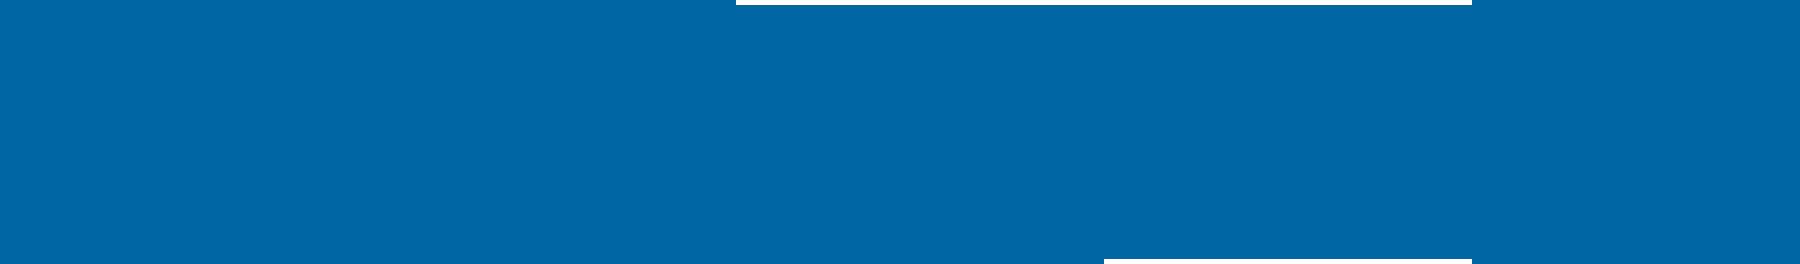 Corning_Logo_301Blue_6in.png